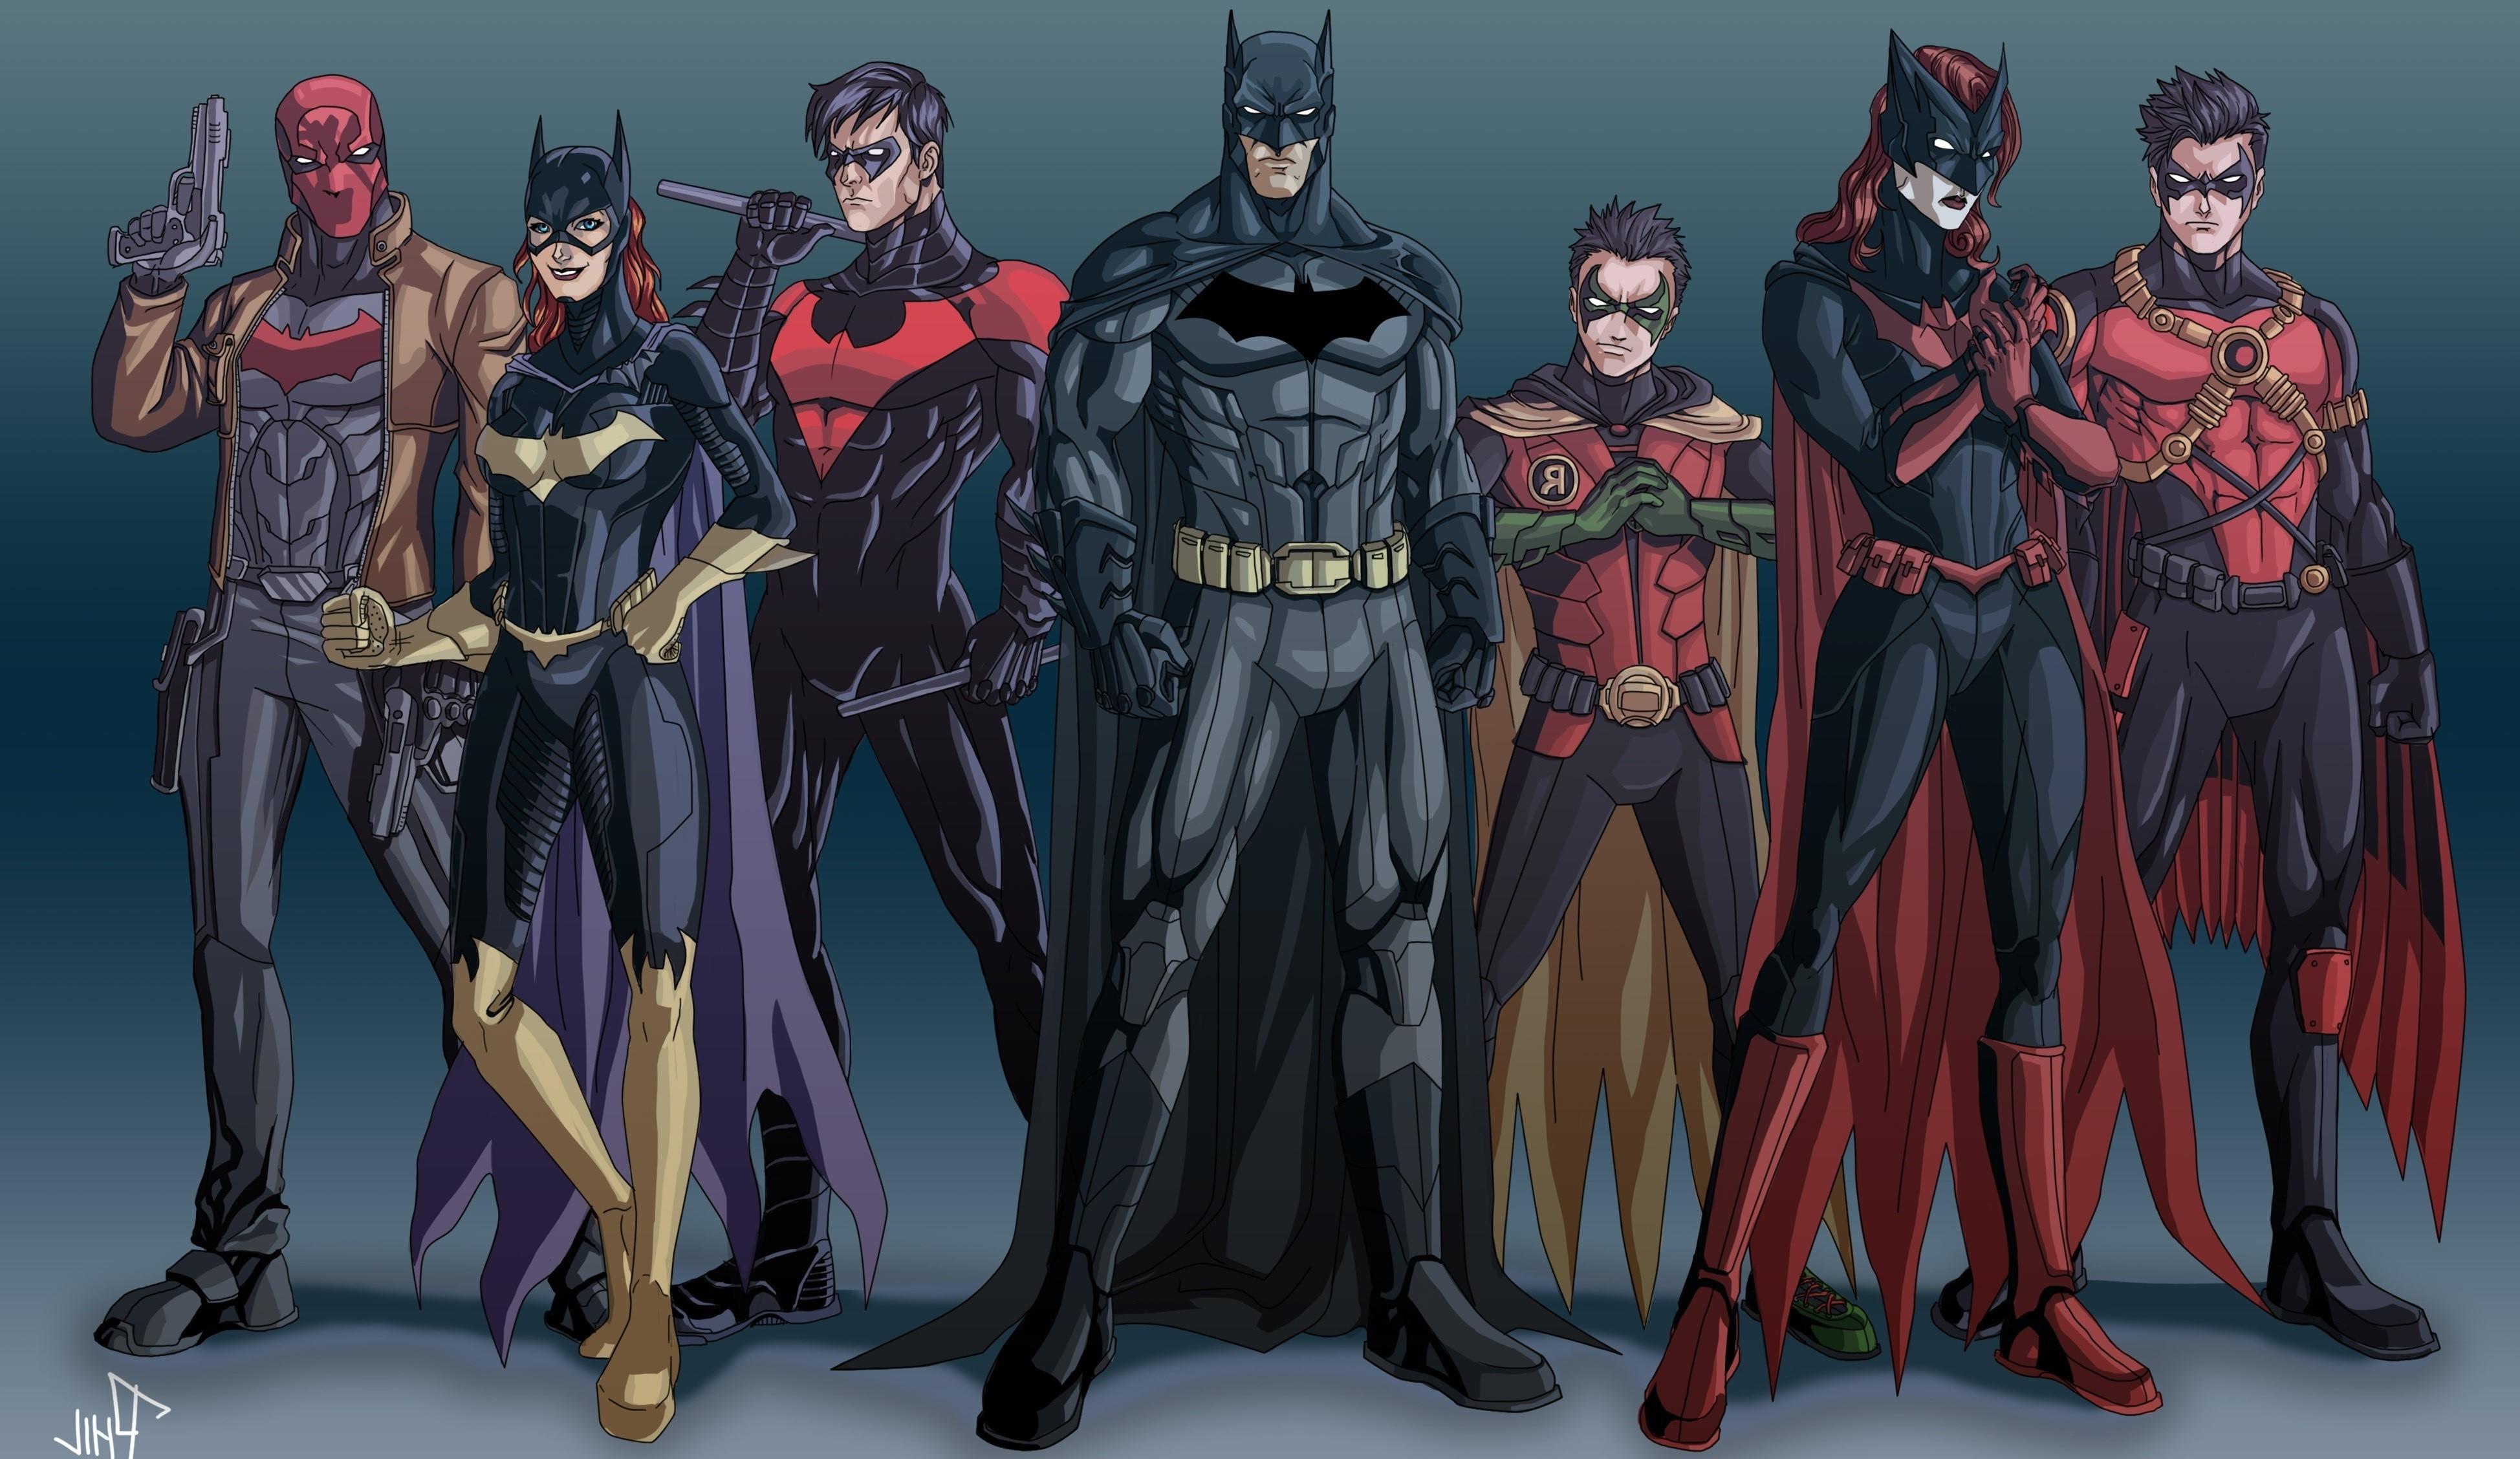 3896x2256 Px Batgirl Batman Batwoman DC Comics Nightwing Red Hood Robin Character